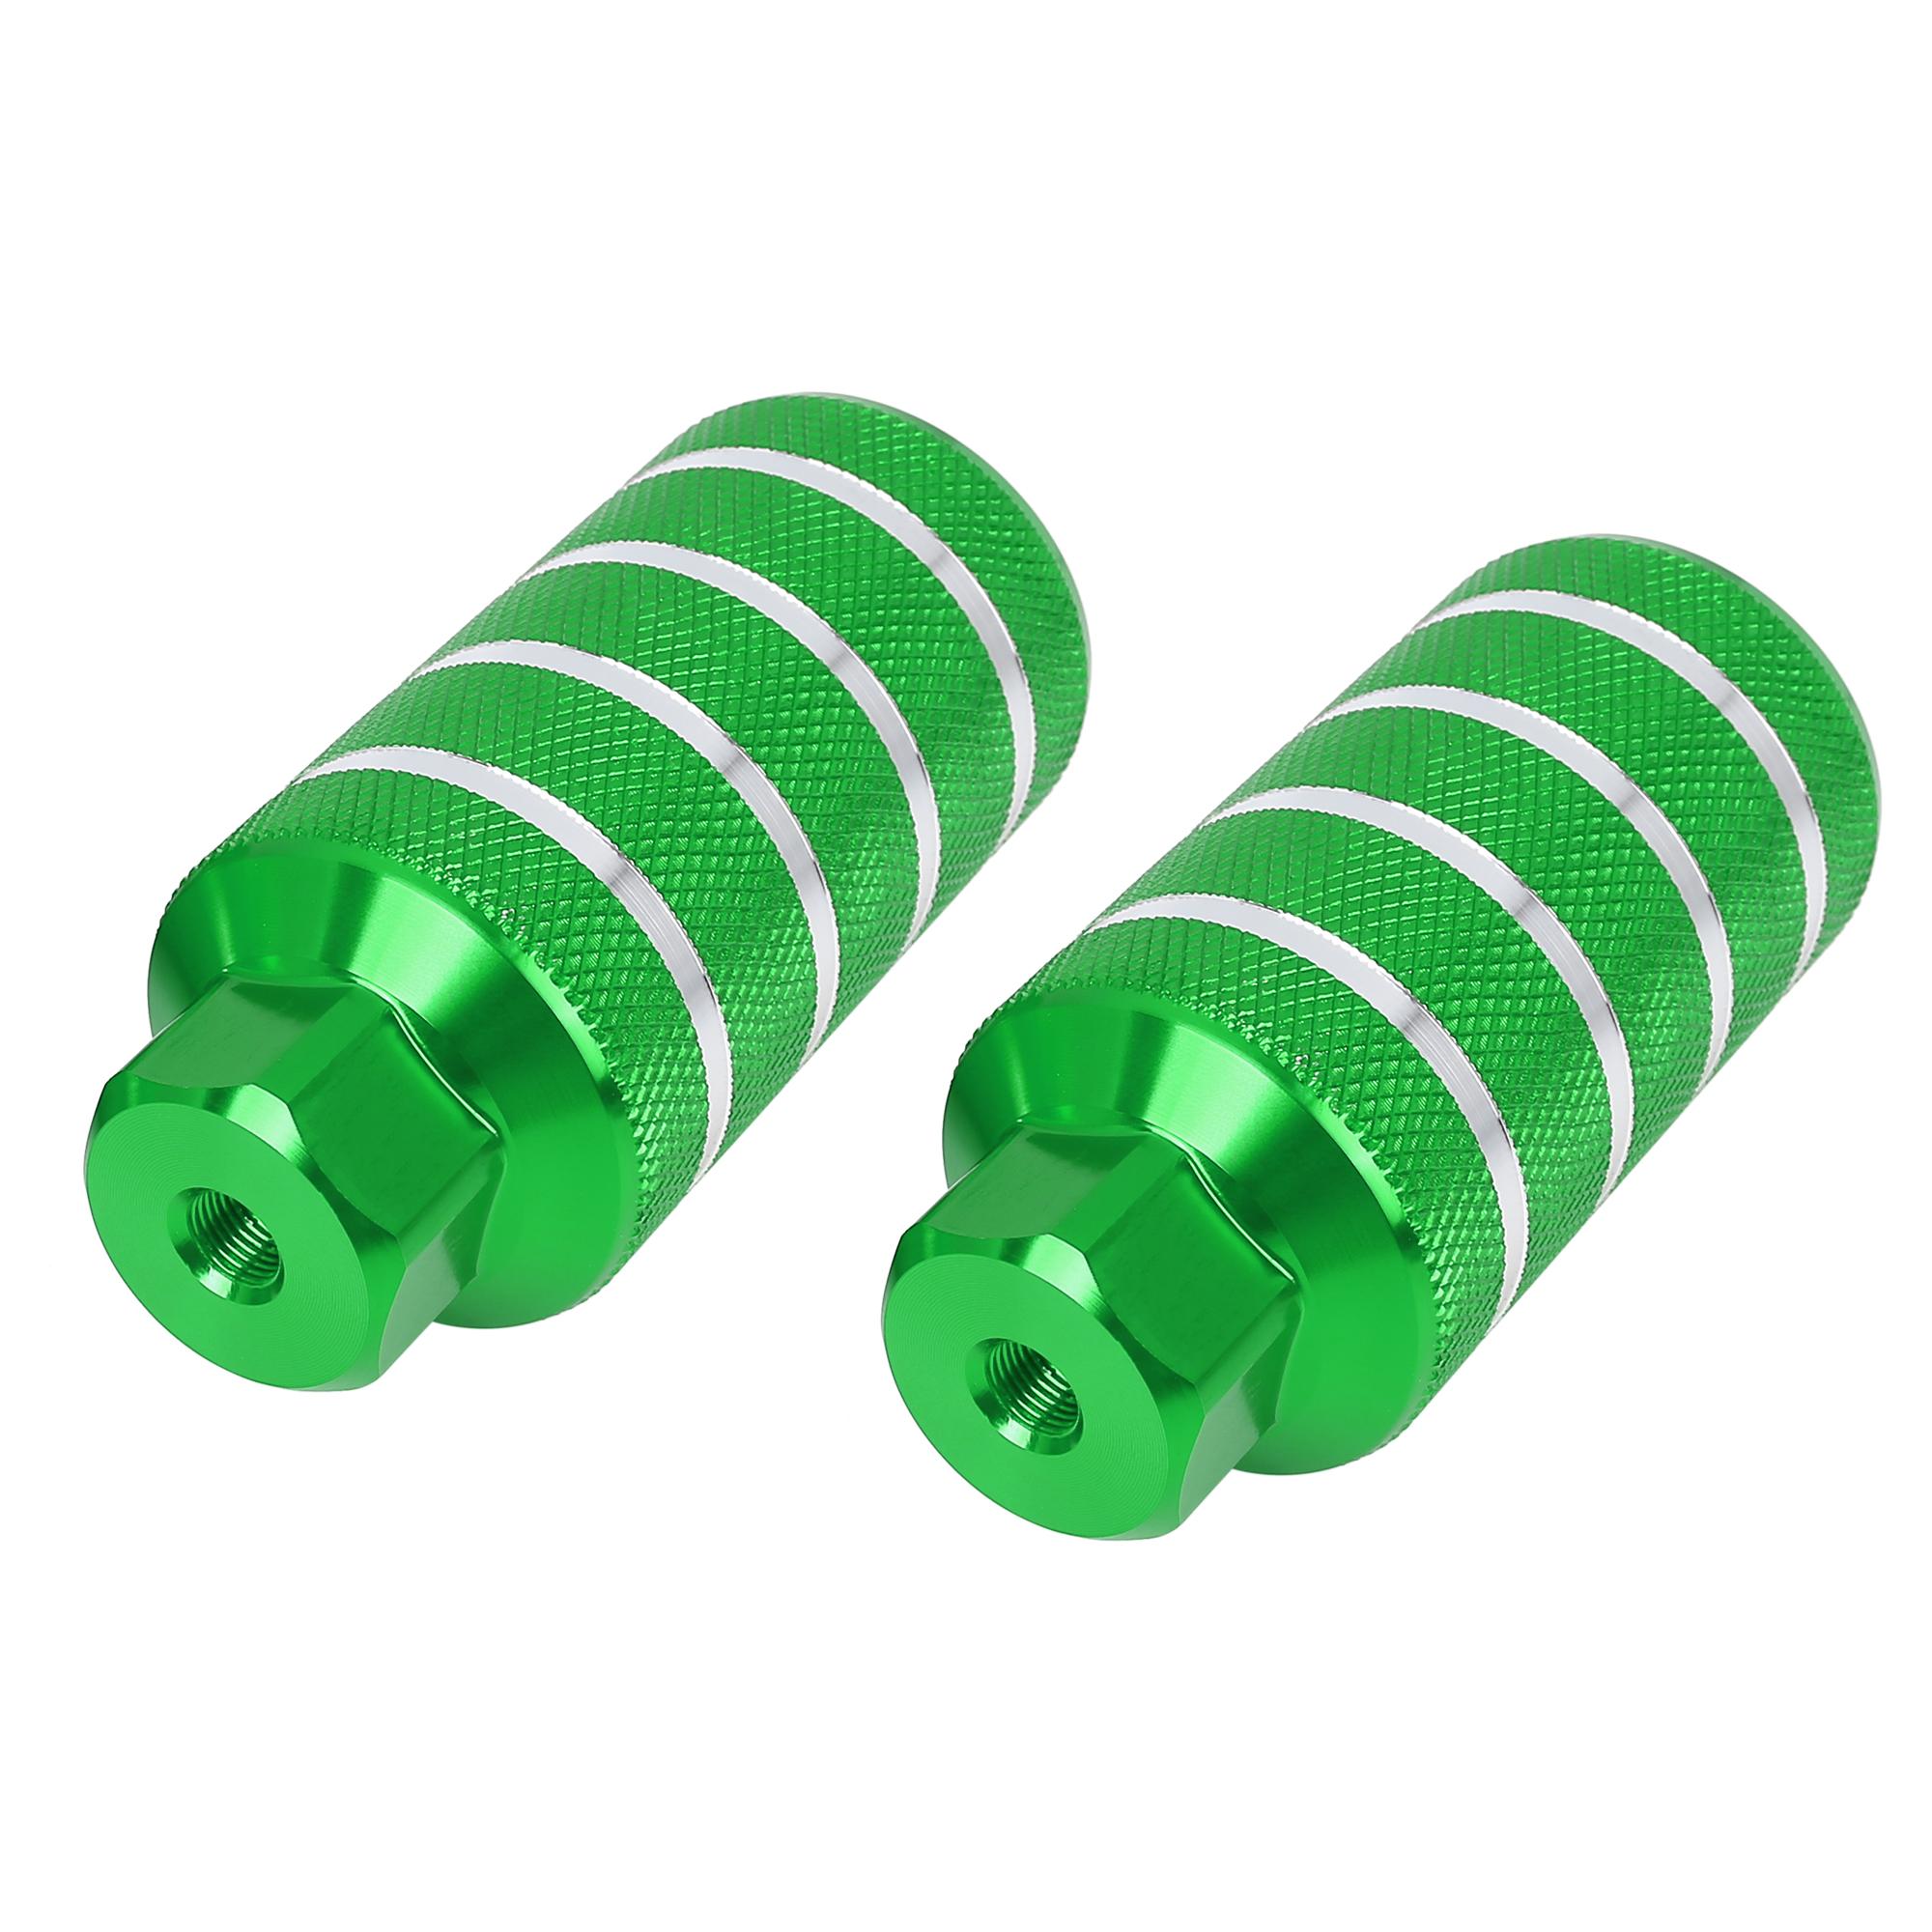 Pair Stripe Cylinder Bike Axle Rear Foot Pegs Fit 3/8 Inch 110x50mm Green